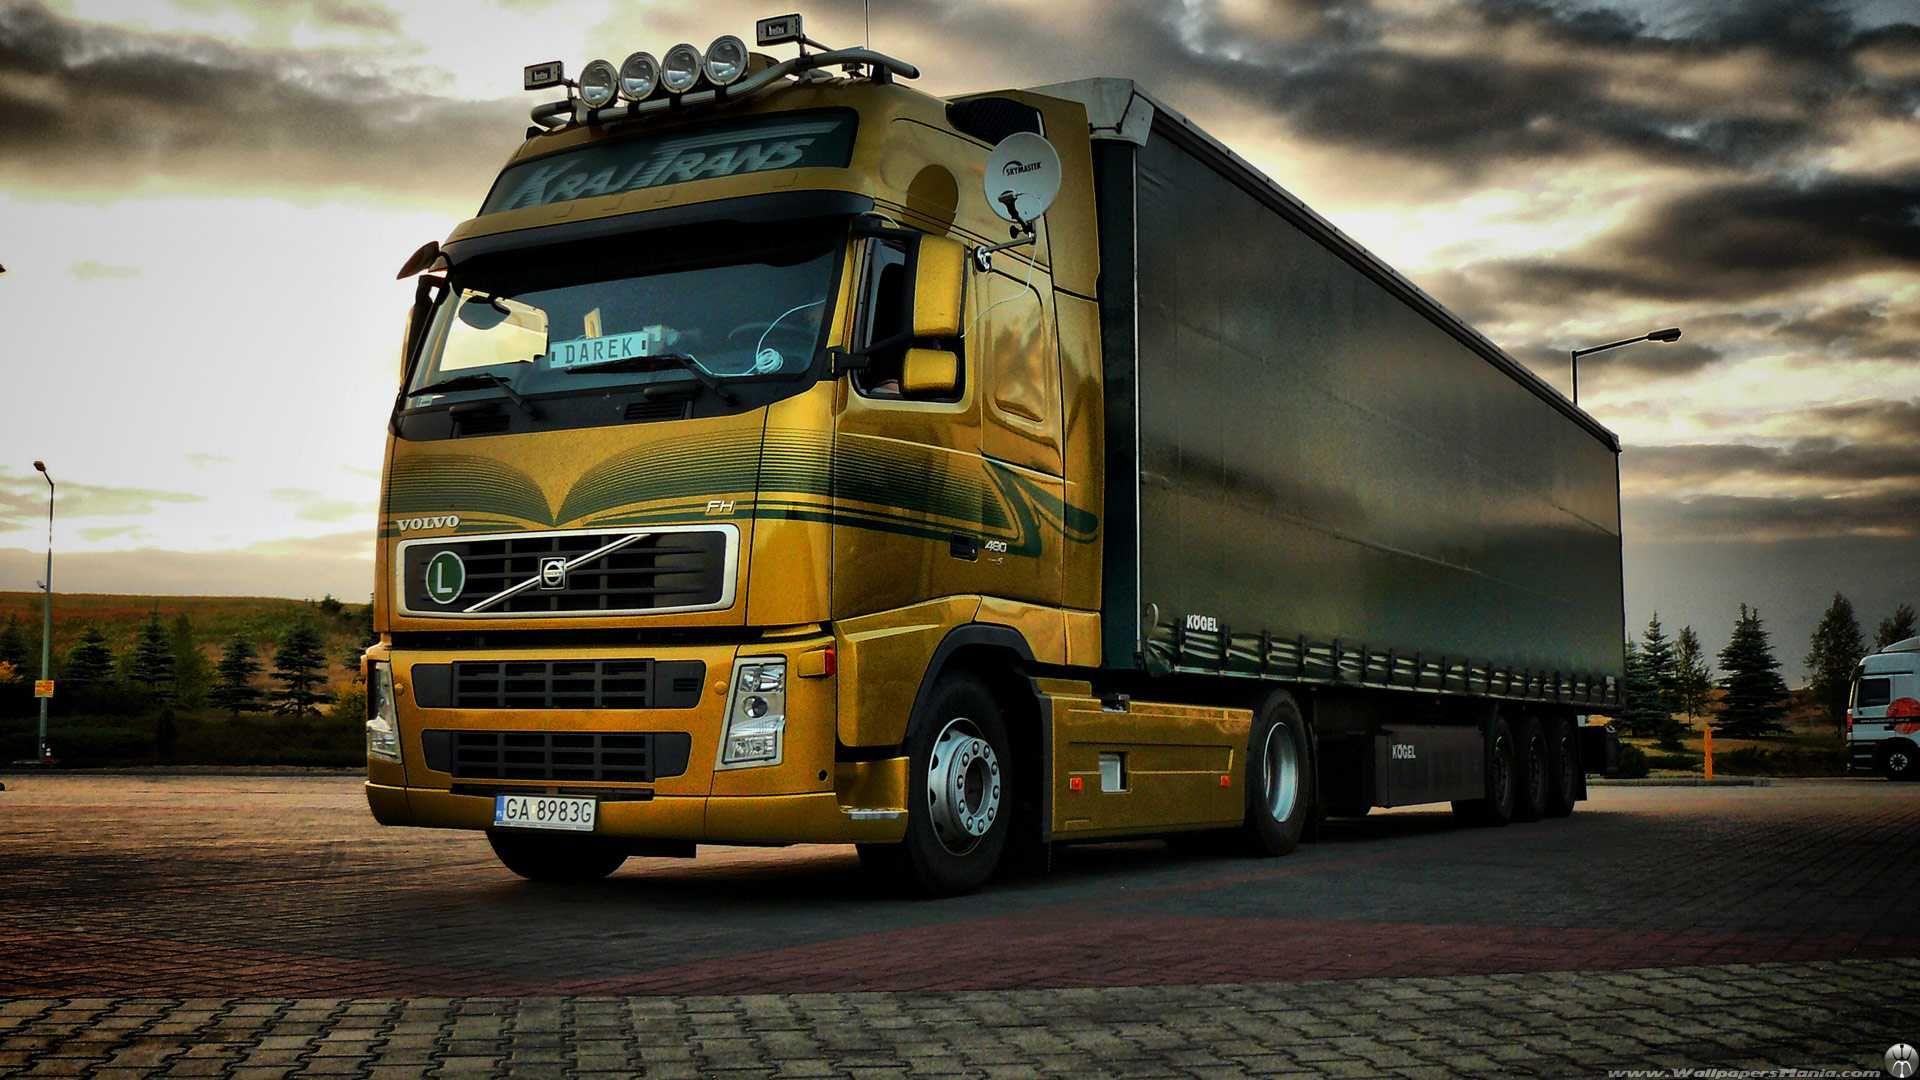 Volvo Truck Wallpaper High Definition Nh6 Trucks Volvo Trucks Volvo